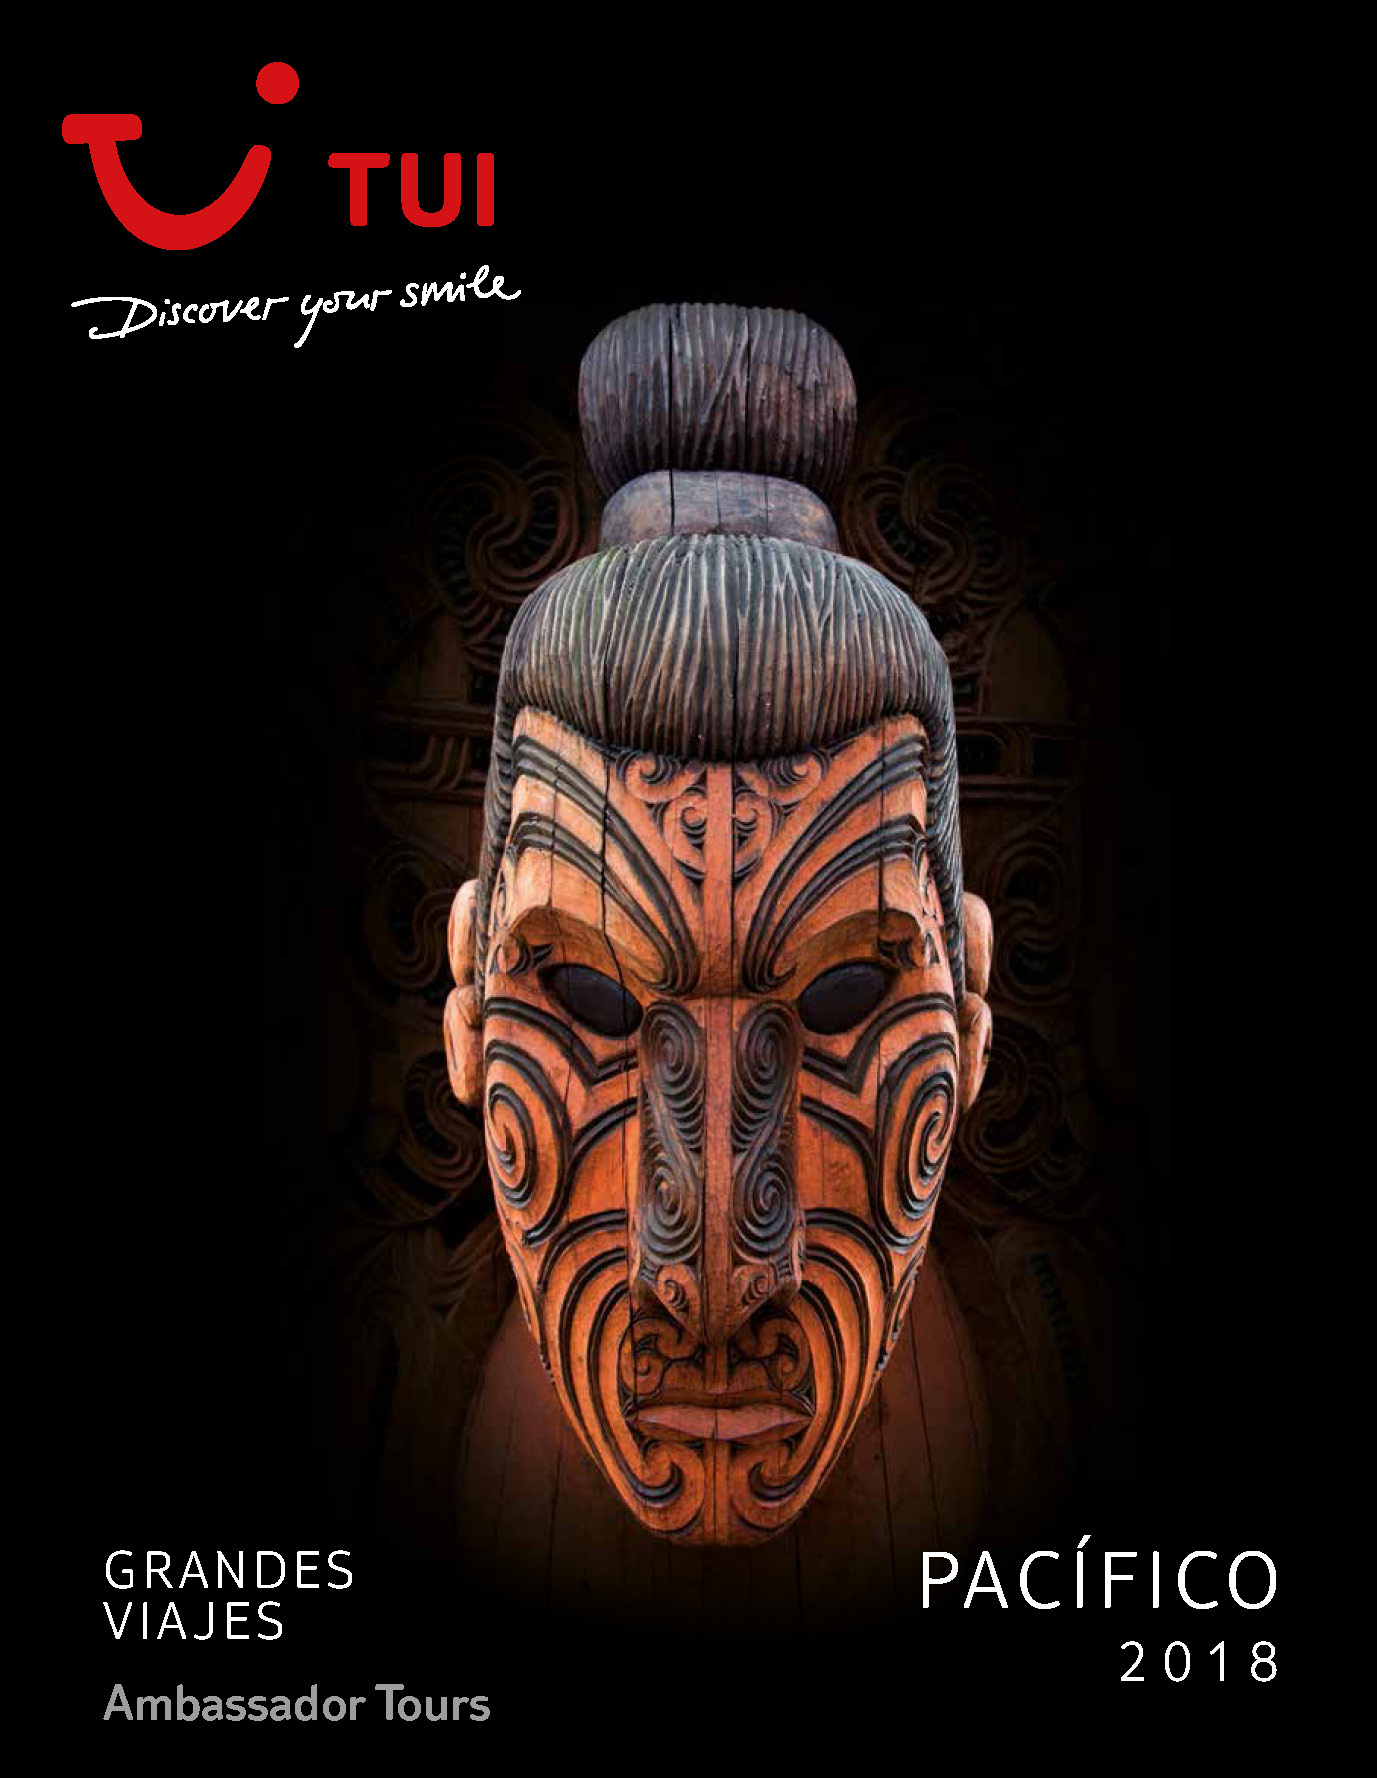 Catalogo TUI Ambassador Tours Pacifico 2018